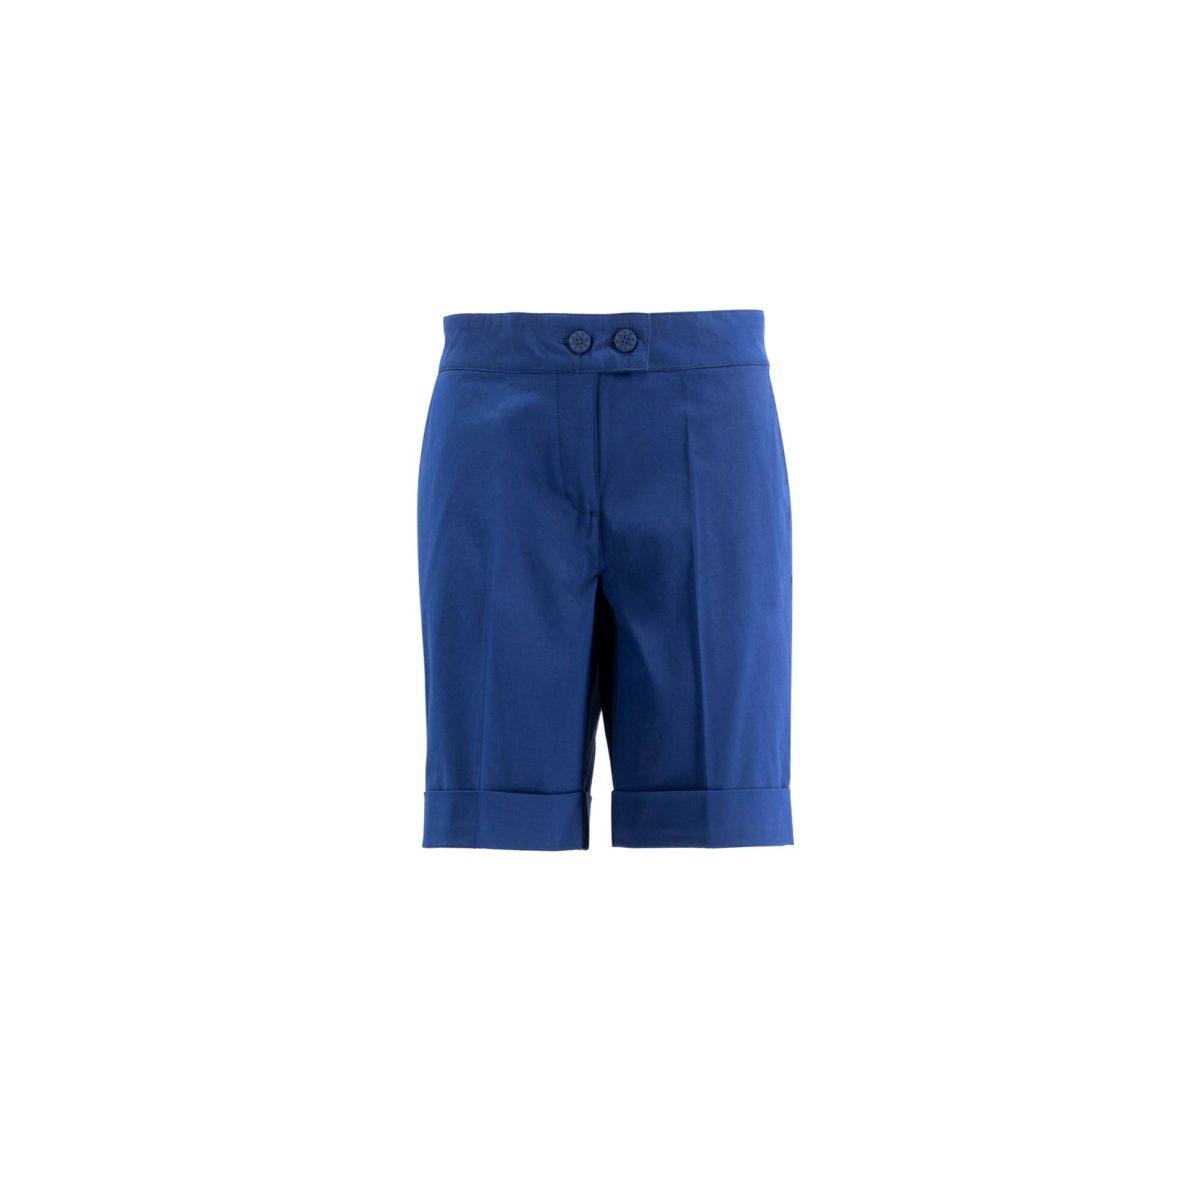 Shorts Bermuda Blu - vista frontale   Nicla